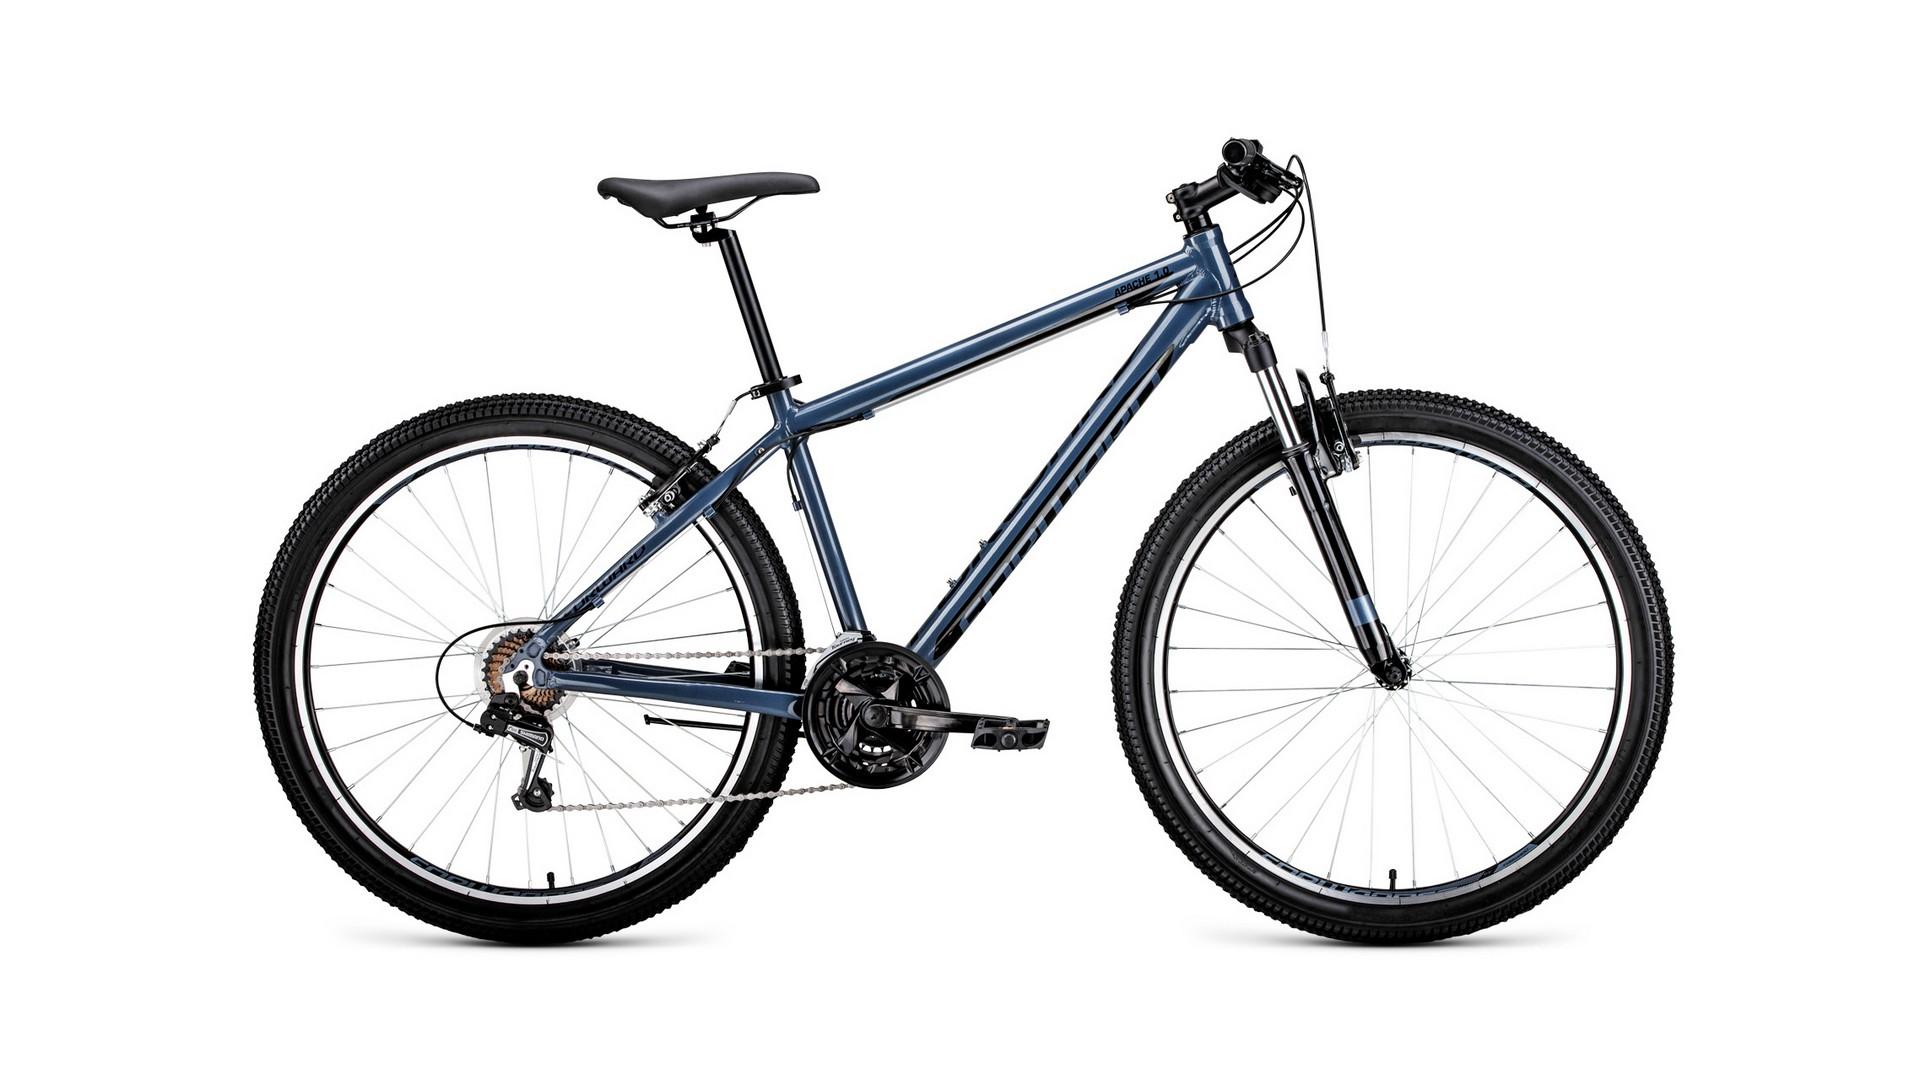 FORWARD Велосипед Forward Apache 27.5 1.0 (2020) серый/черный 17